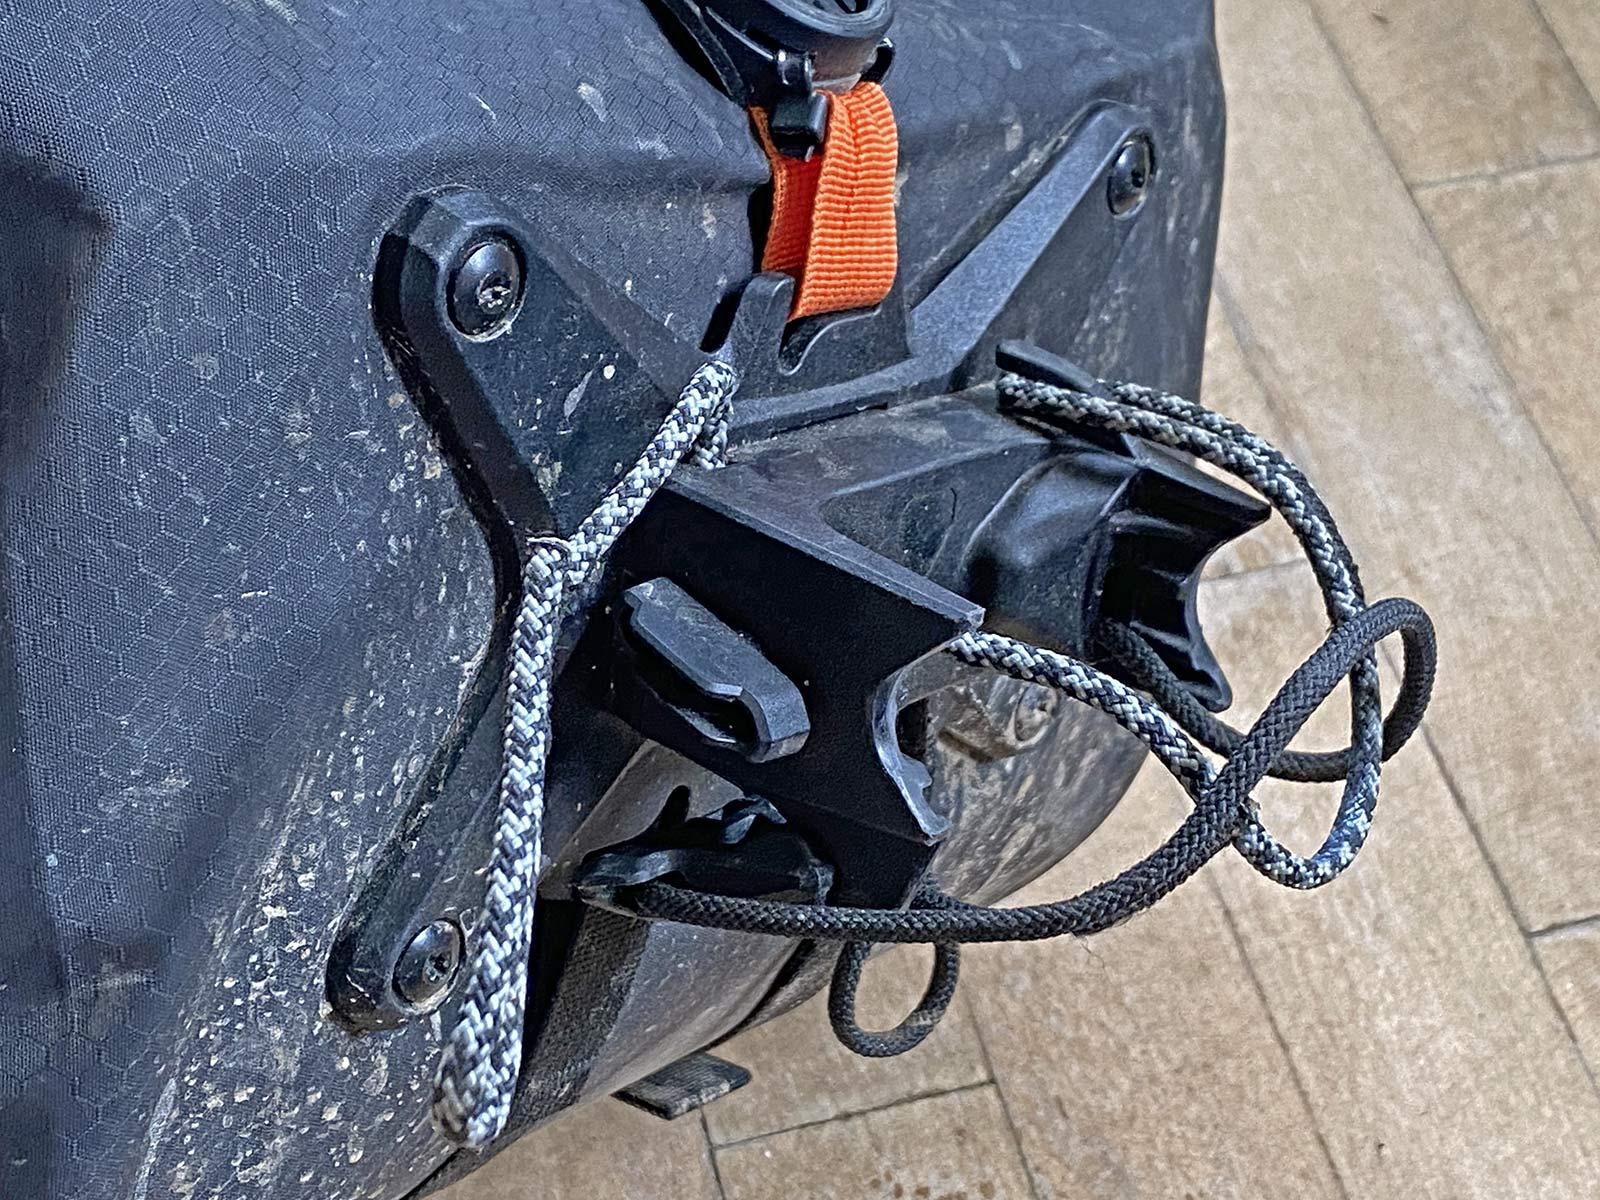 Ortlieb Handlebar Pack QR, made-in-Germany waterproof quick release 11L bikepacking bar bag,Bar-Lock mounting